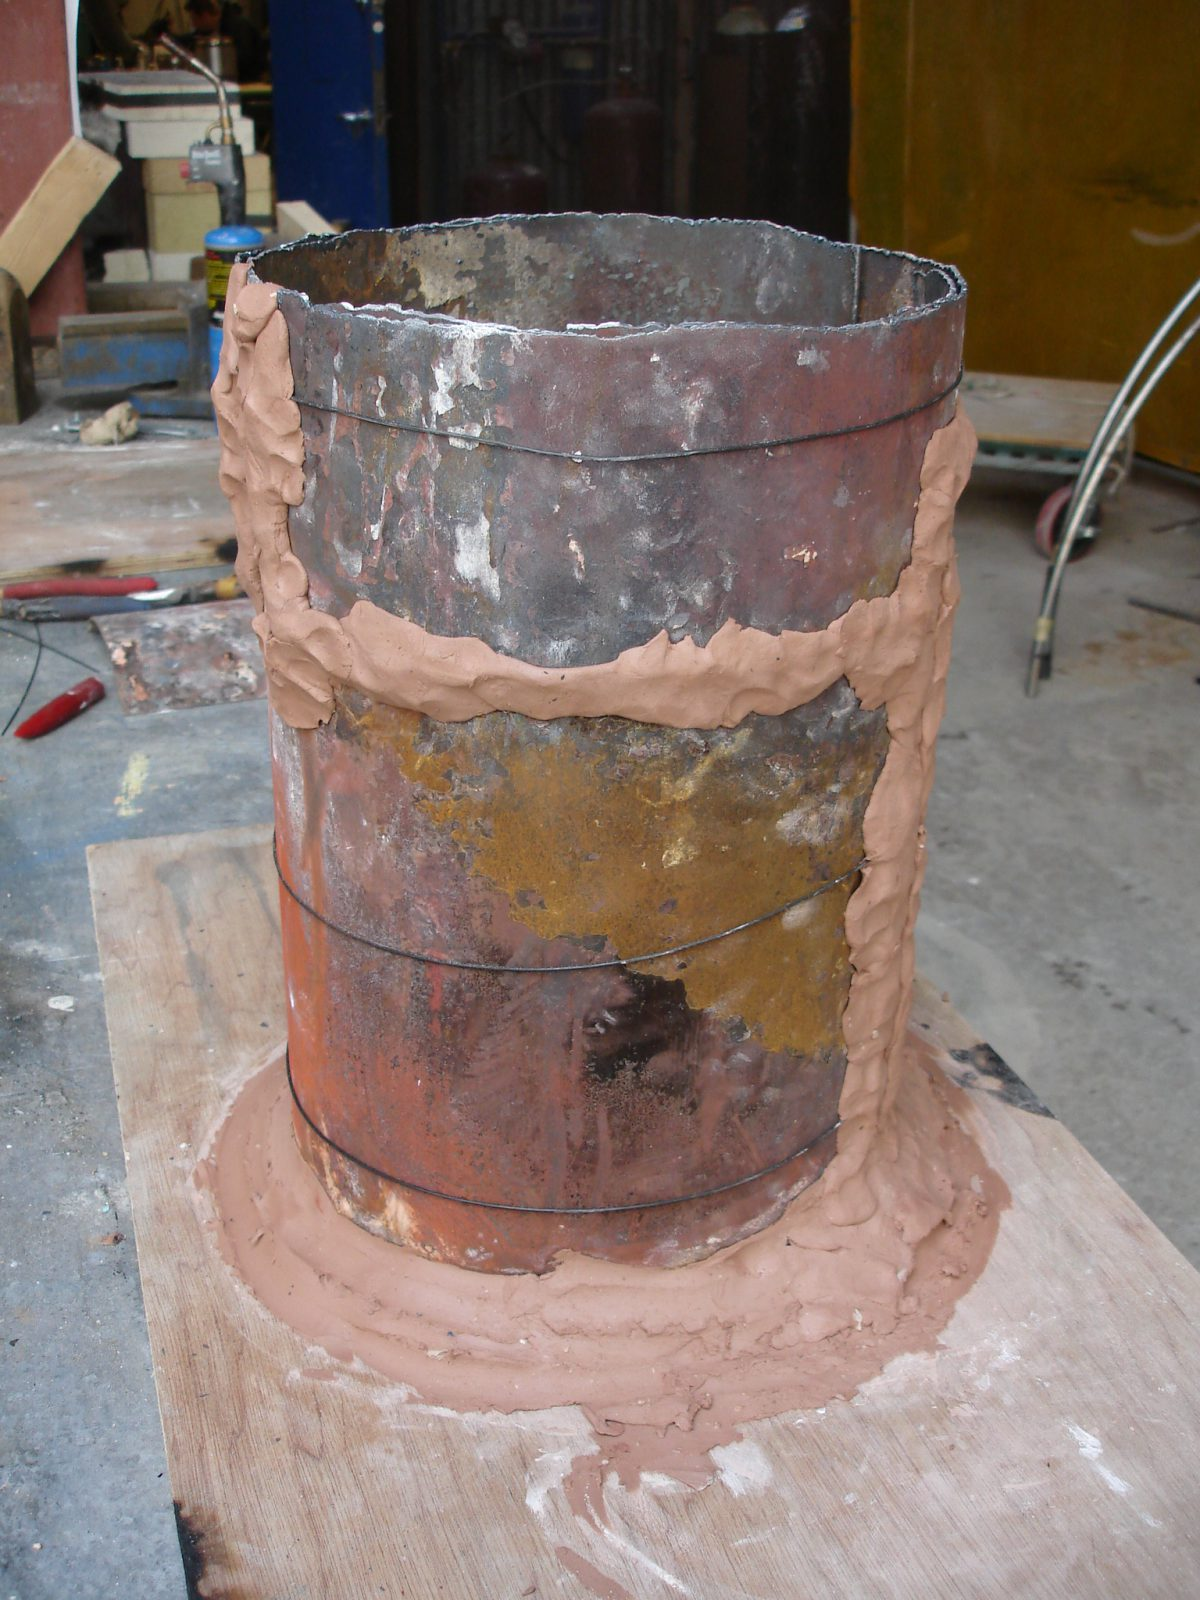 Divider - wip - Prepare the flask, ch3, sculpture, process, wax